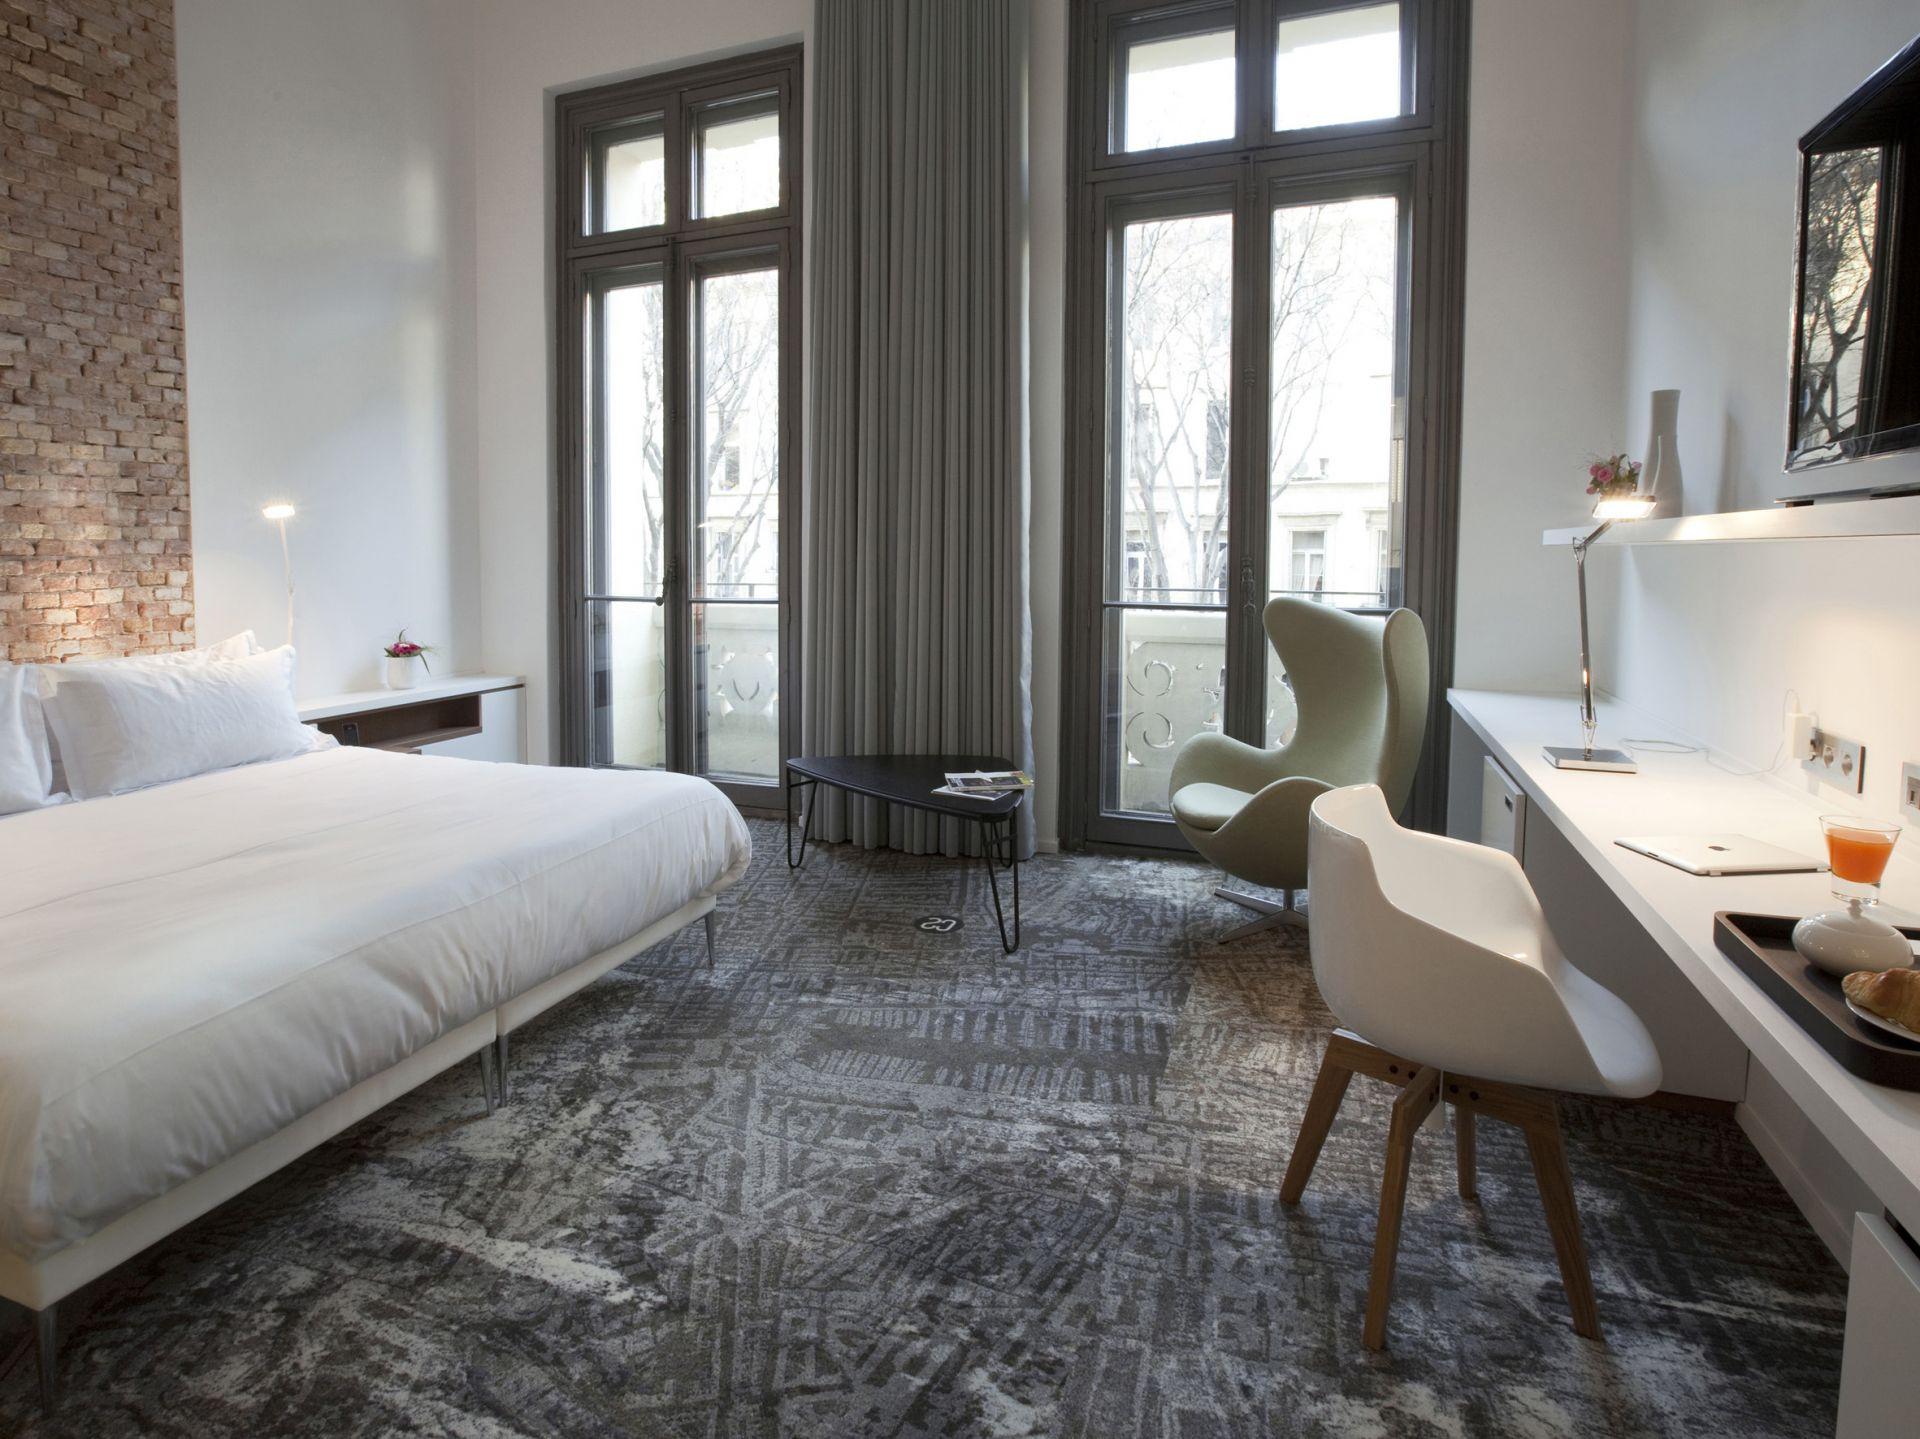 H tel 4 toiles au v lodrome ac hotel marseille hotel for Hotel au sud de la france